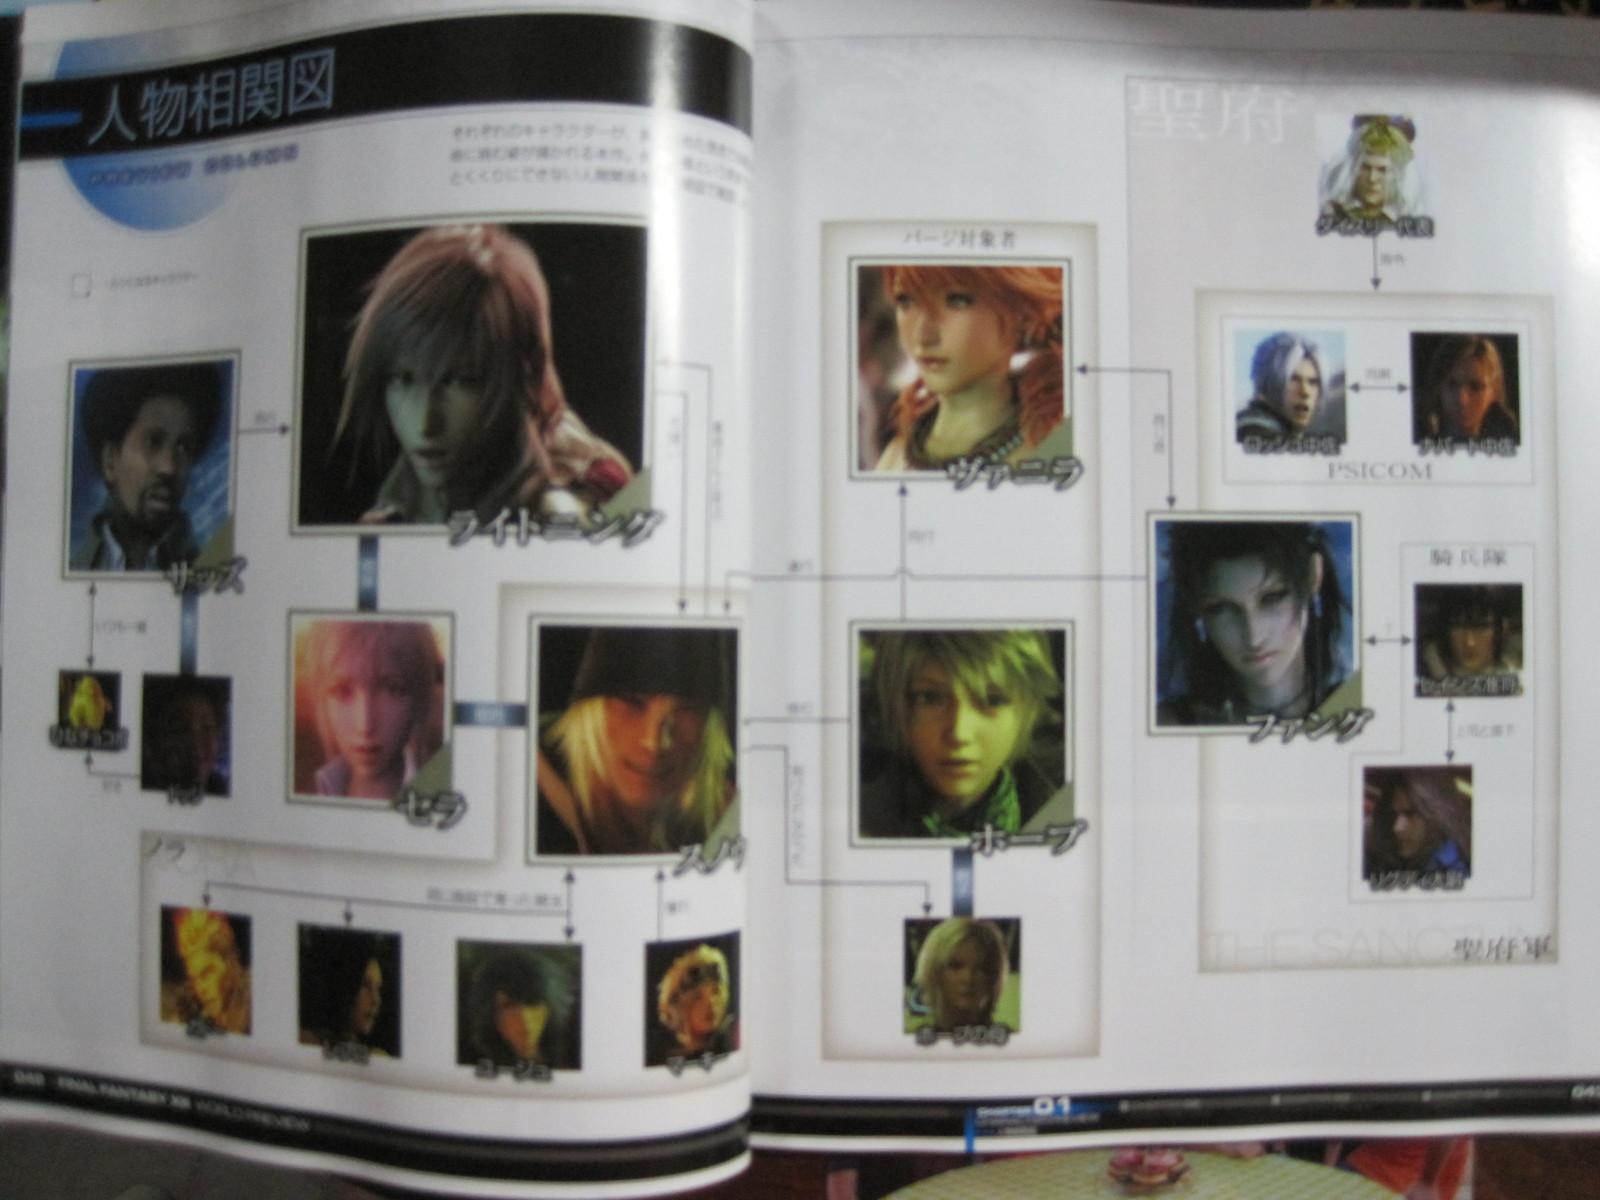 Final-Fantasy-XIII-1-2